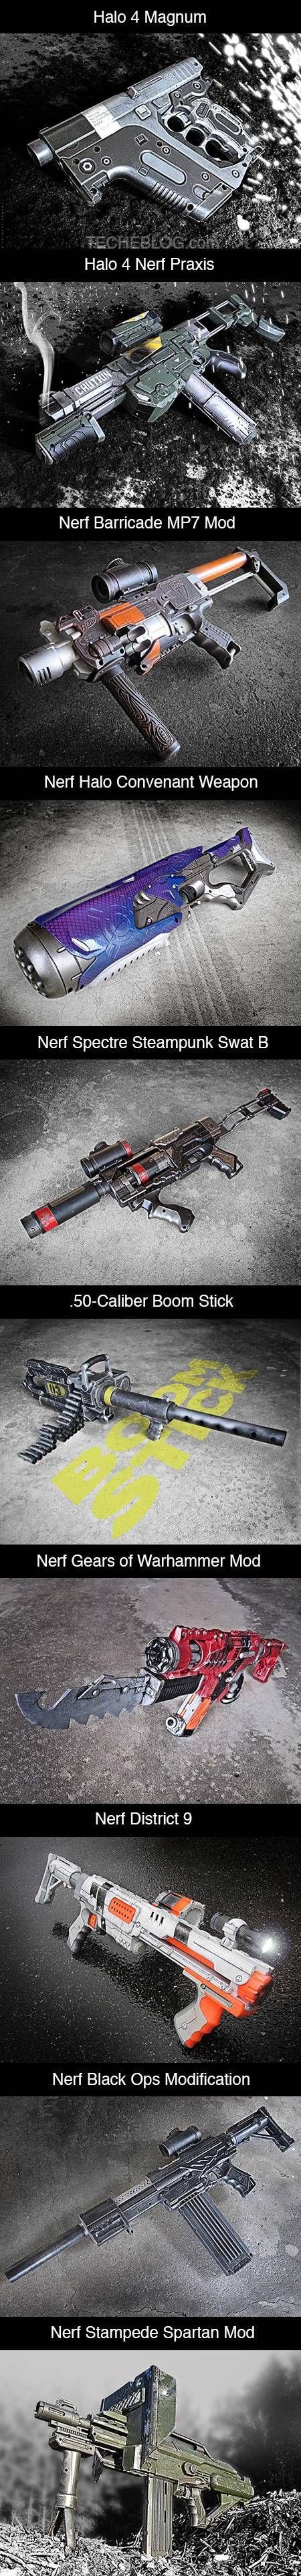 Coolest NERF Gun Mods Ever - TechEBlog